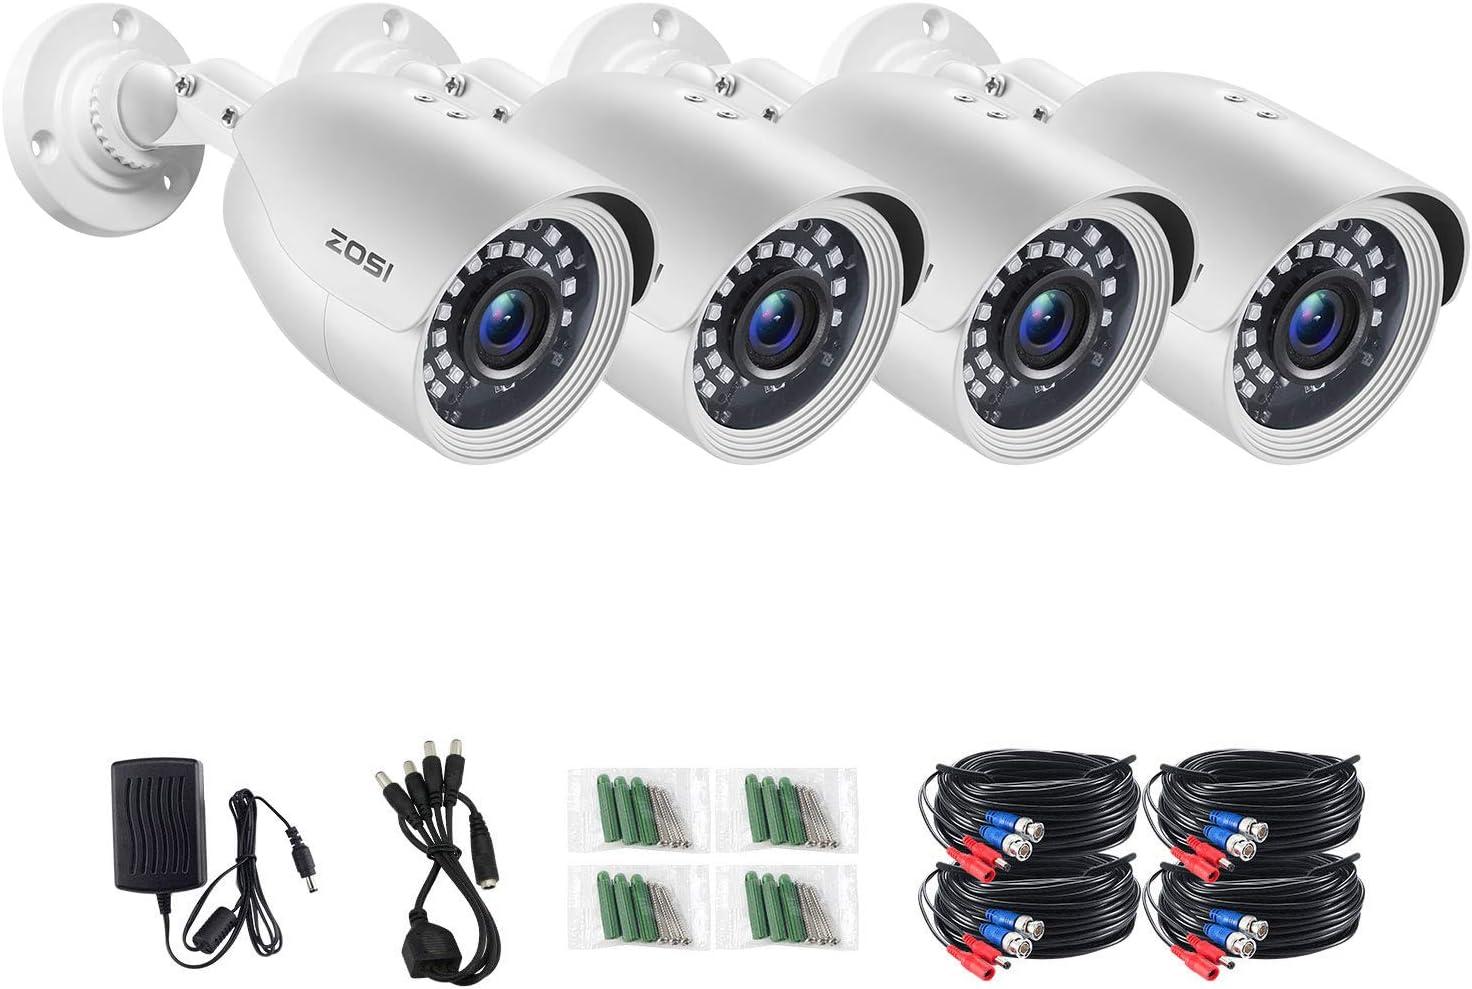 ZOSI 4 Pack 2MP 1080p HD-TVI Security Camera Outdoor Indoor 1920TVL,24PCS LEDs,80ft Night Vision, 90°View Angle, Weatherproof Surveillance CCTV Bullet Camera